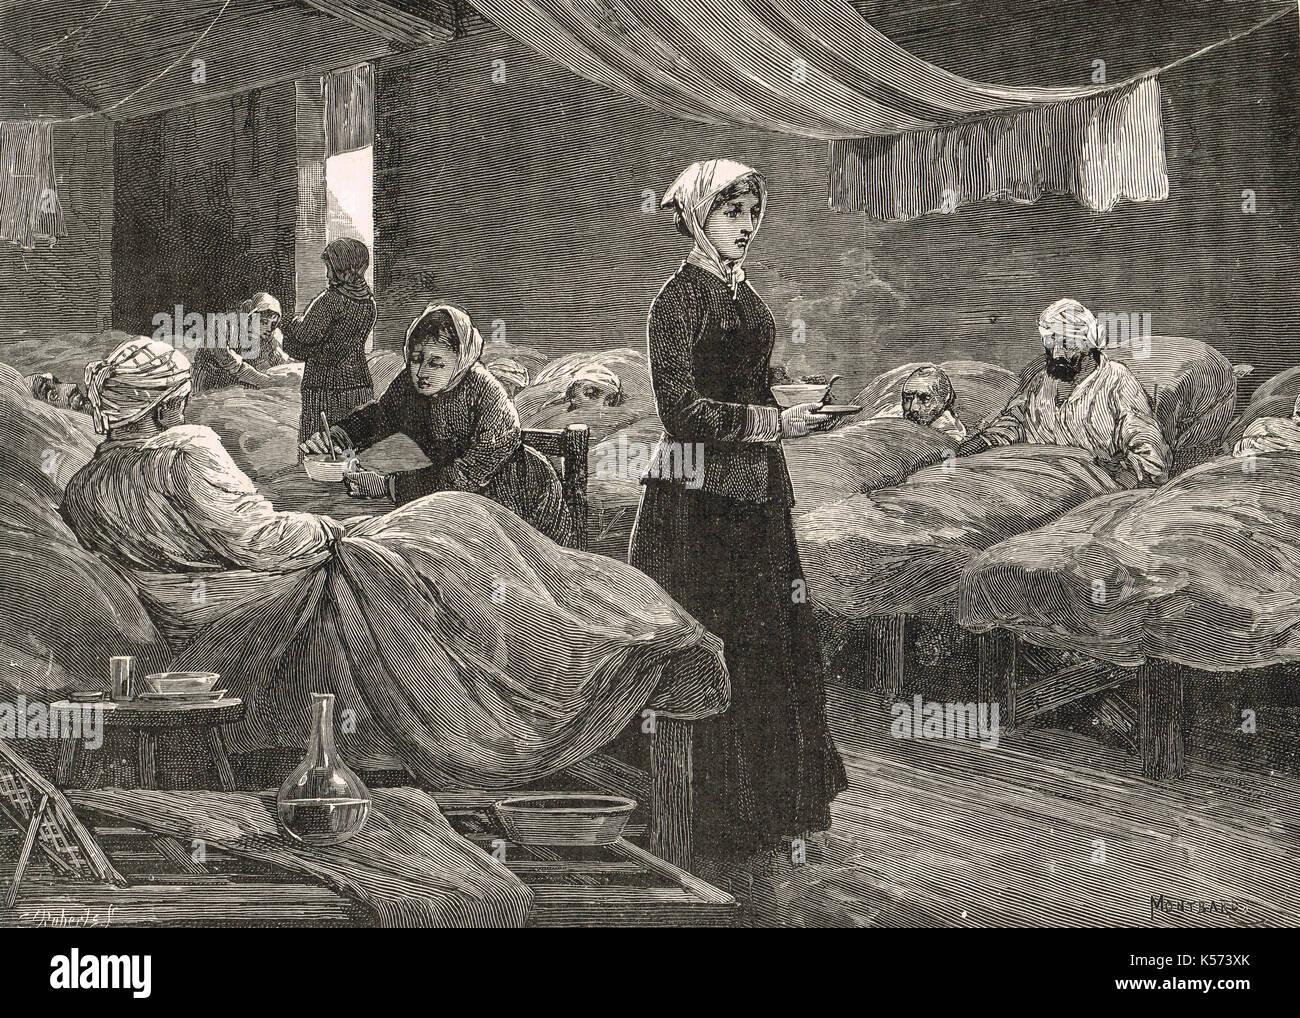 Scutari Hospital, Crimea, Crimean war - Stock Image